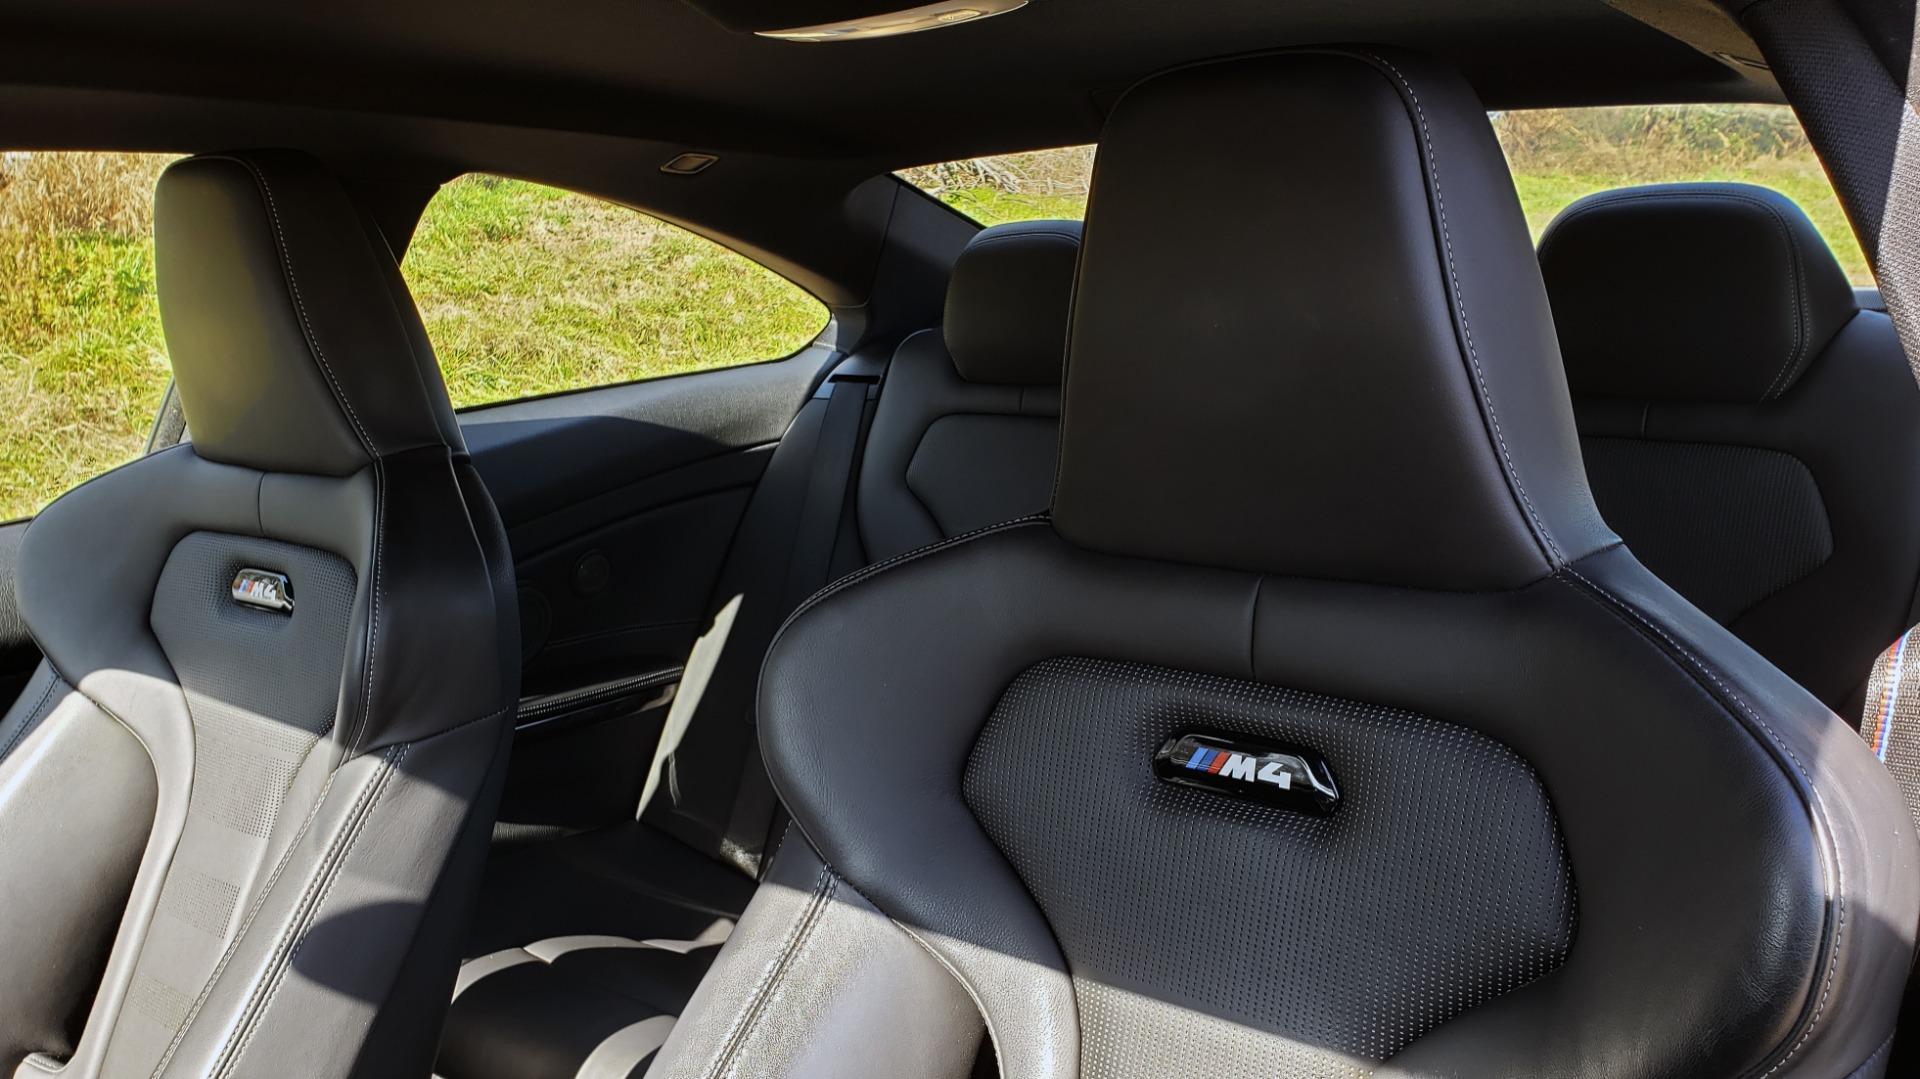 Used 2018 BMW M4 COMP PKG / EXEC / M-DRIVER / PARK CNTRL / ACTIVE BLIND SPOT for sale Sold at Formula Imports in Charlotte NC 28227 38